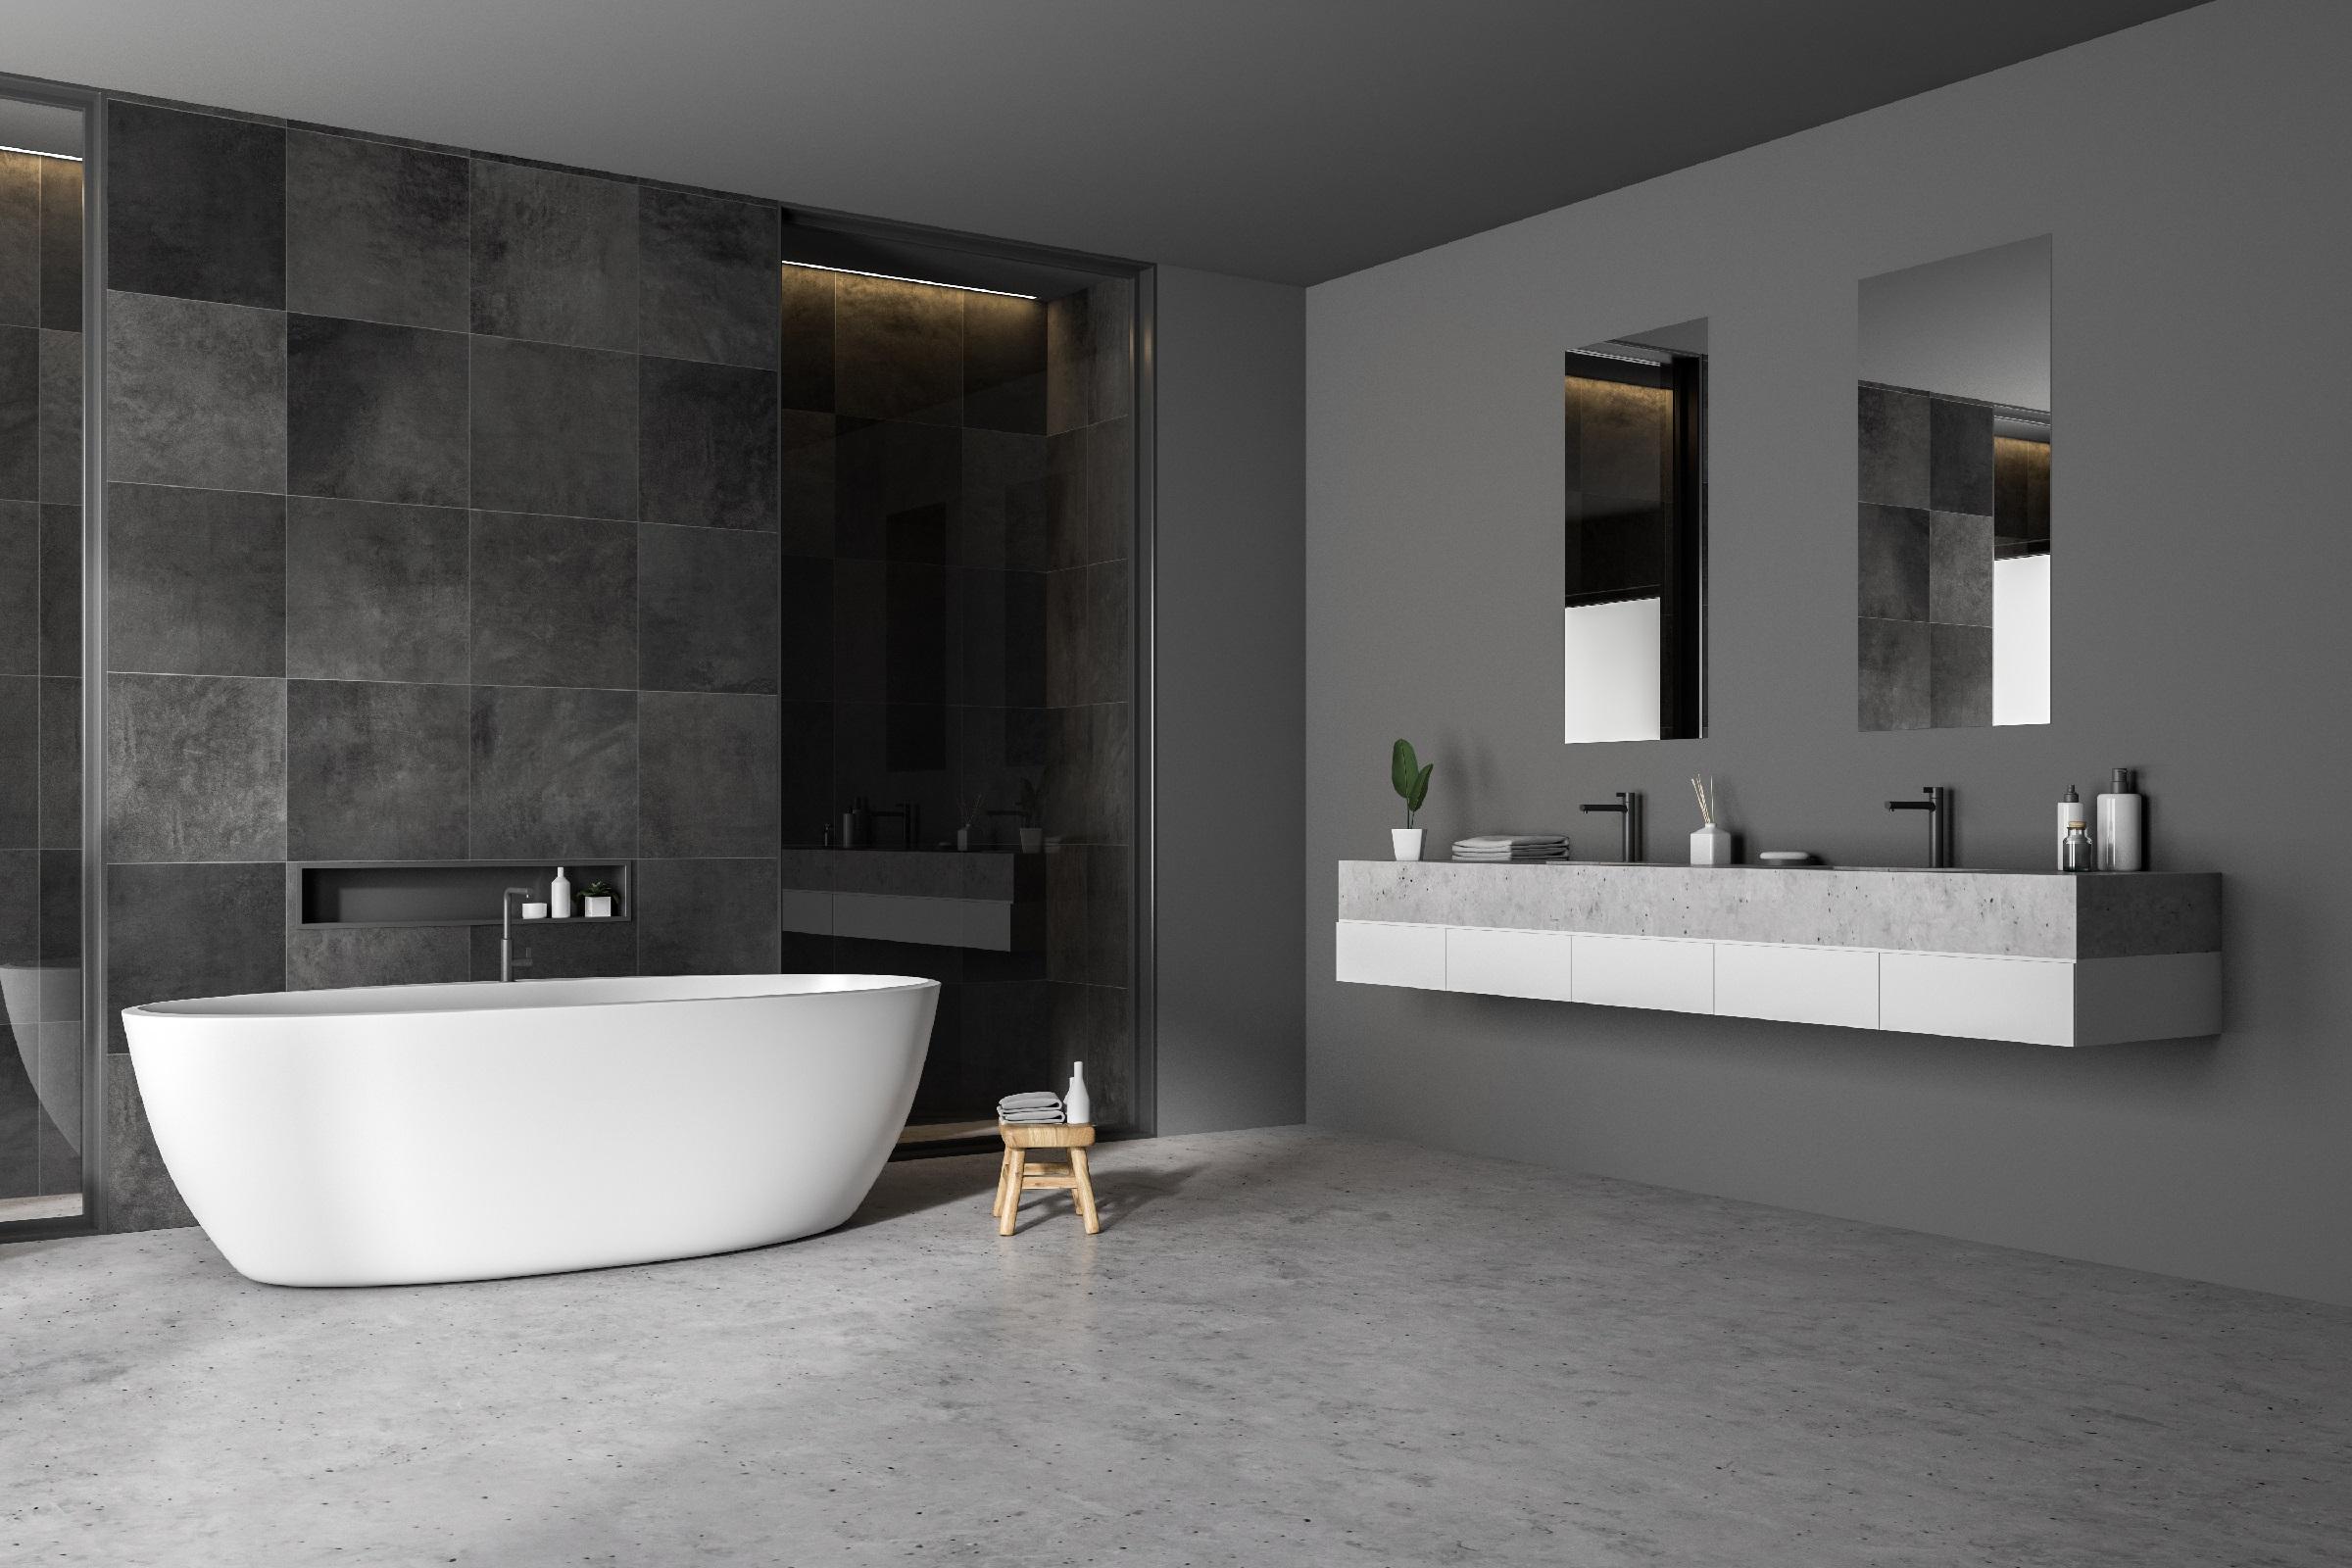 Modern bathroom corner with black tile walls, concrete floor, white bathtub and double sink. 3d rendering